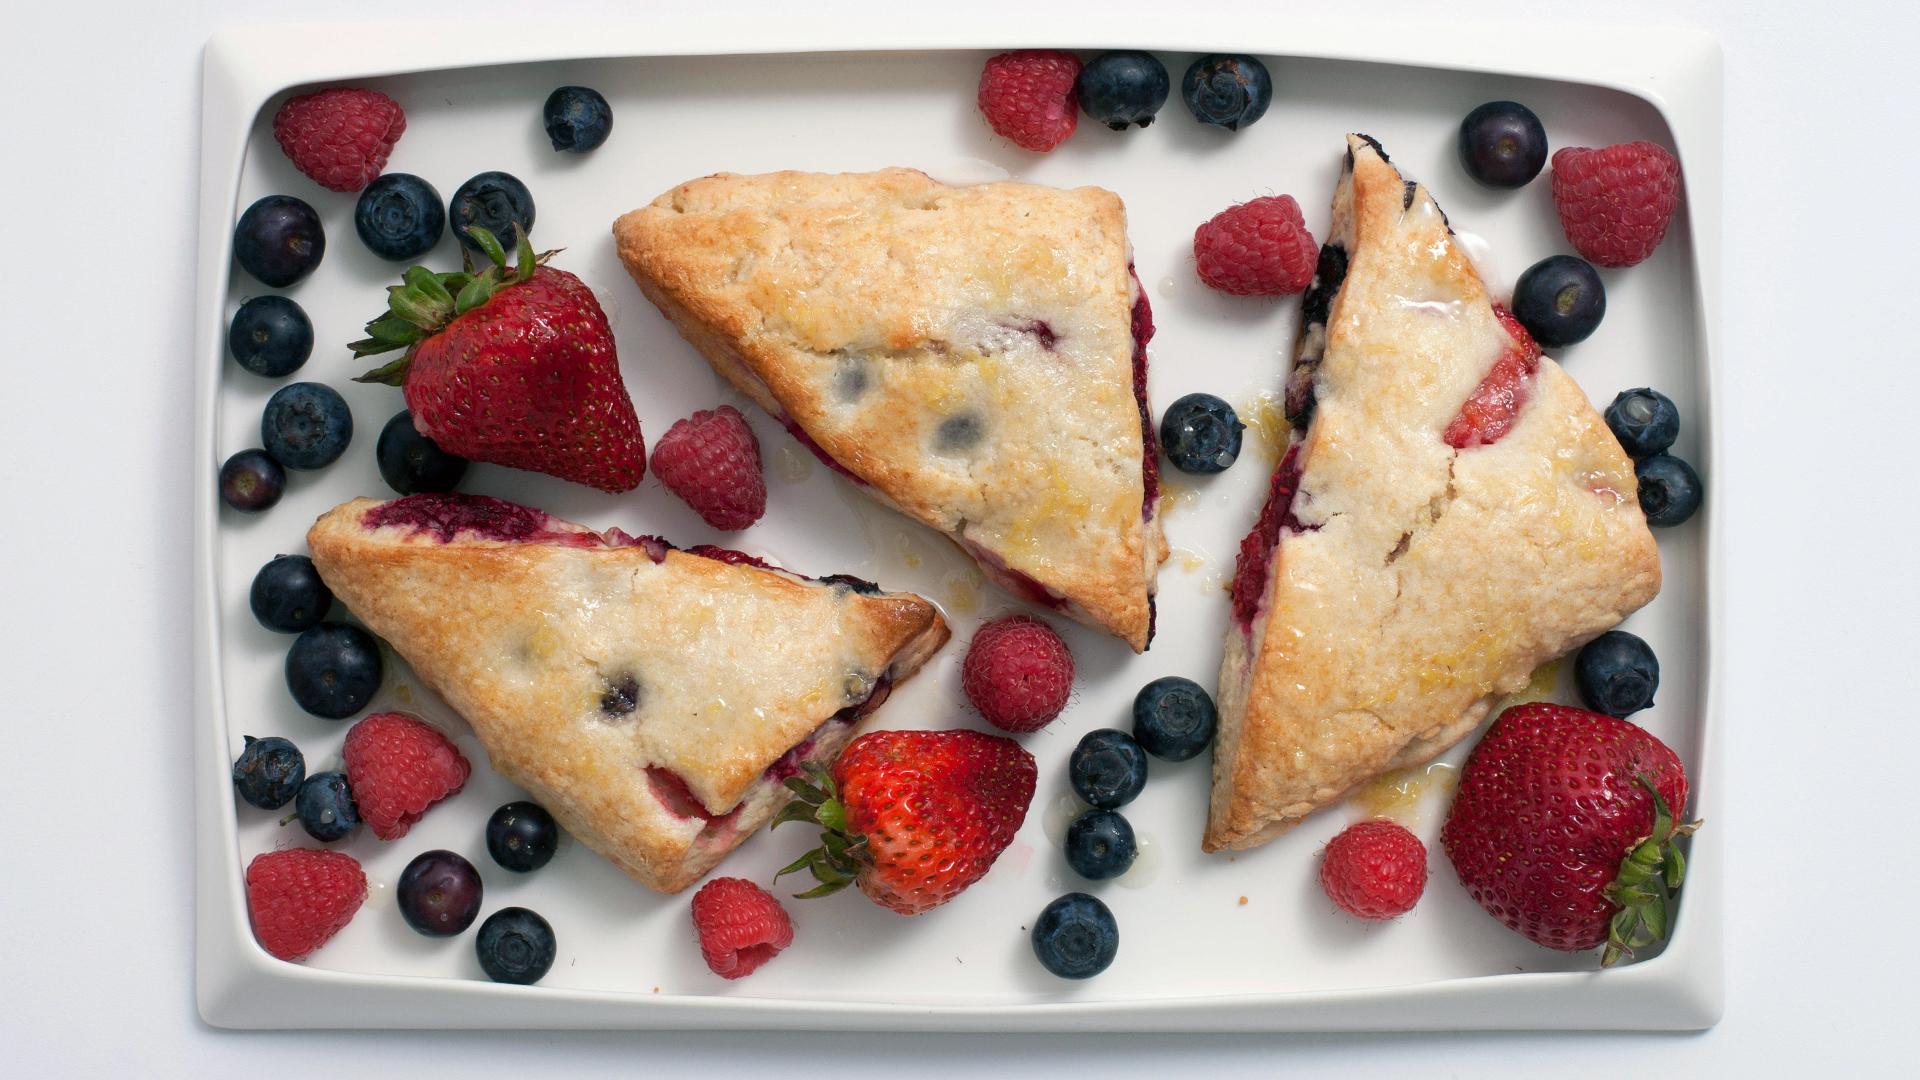 mixed-berry-scones-16x9-Frame.jpg